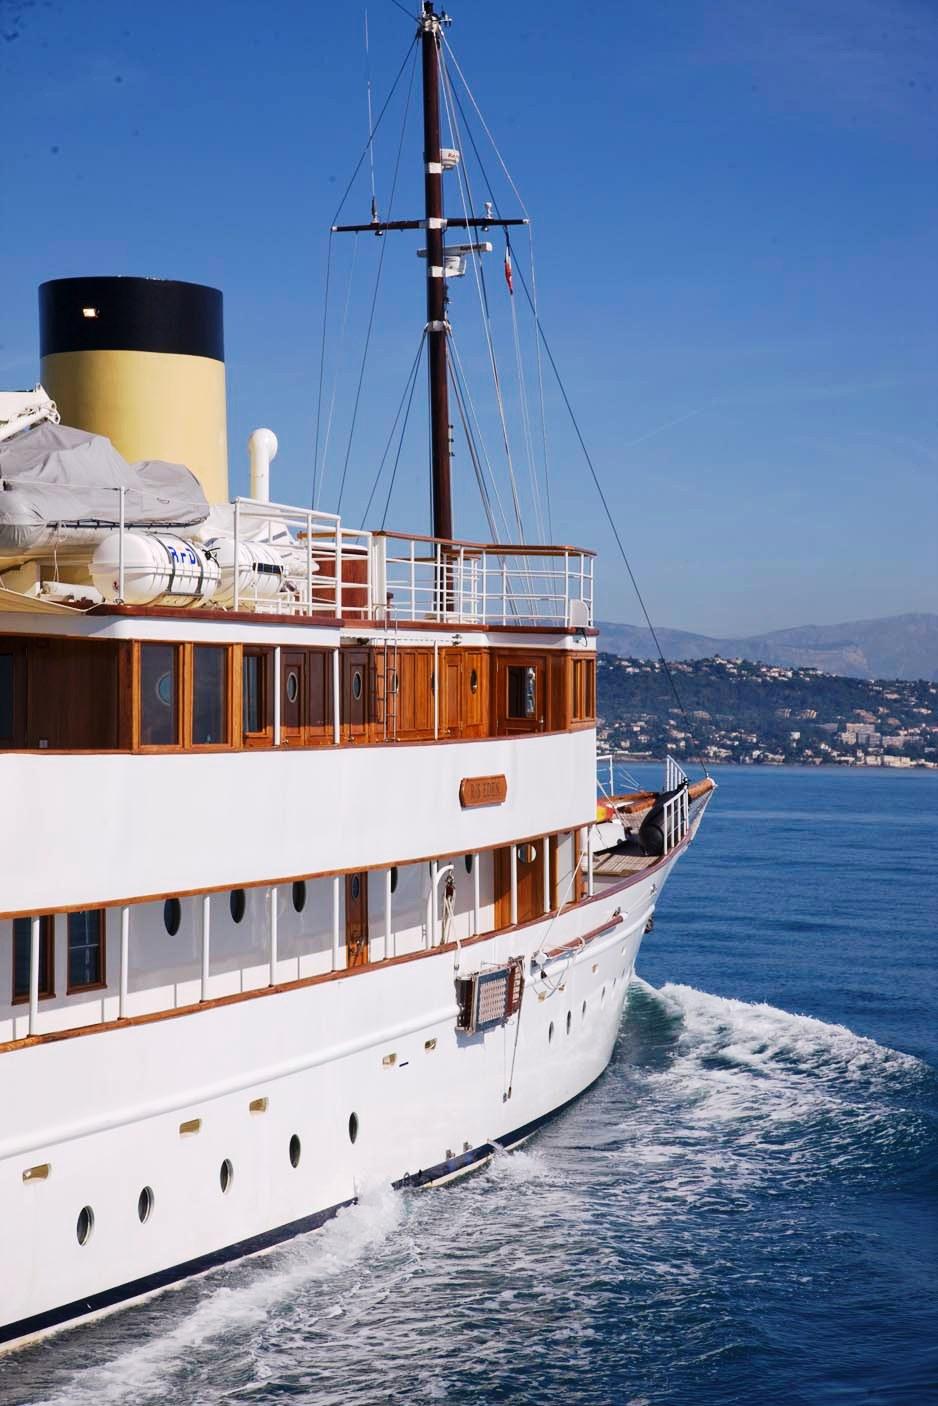 RS-EDEN-Exterior-6 Top 10 Craziest Future Boat Designs